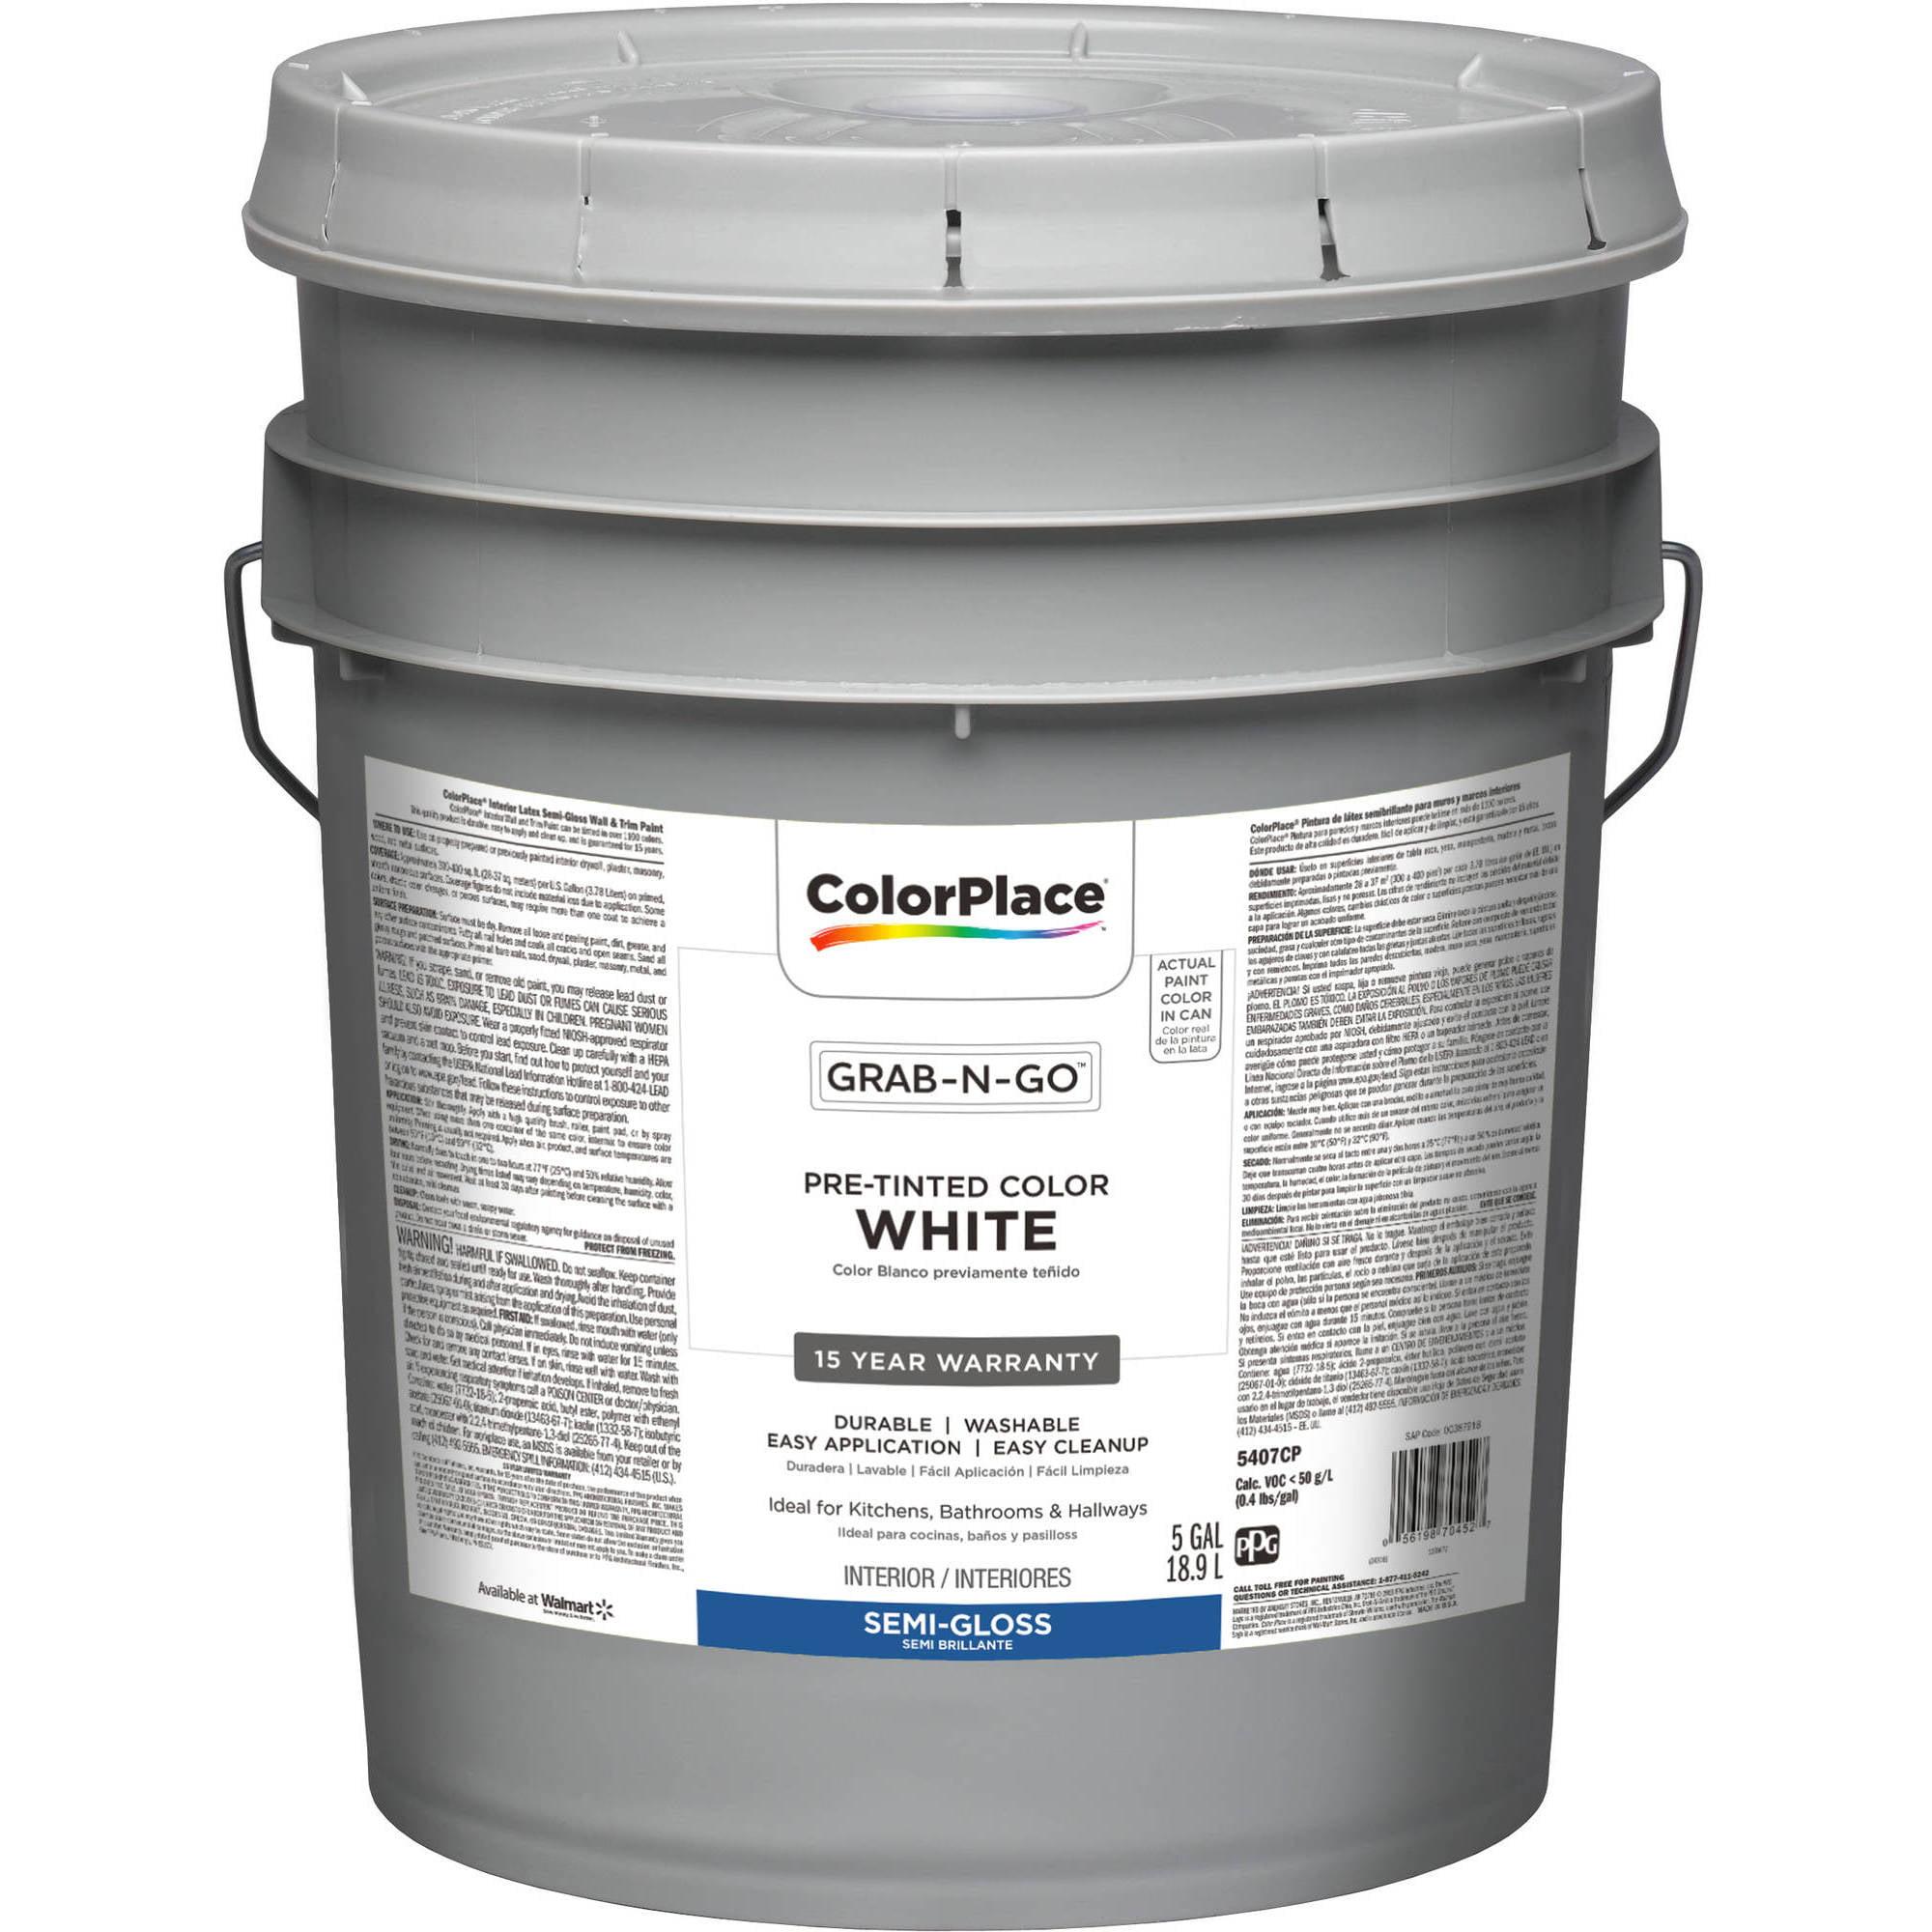 Colorplace Grab N Go White Semi Gloss Interior Paint 5 Gallon